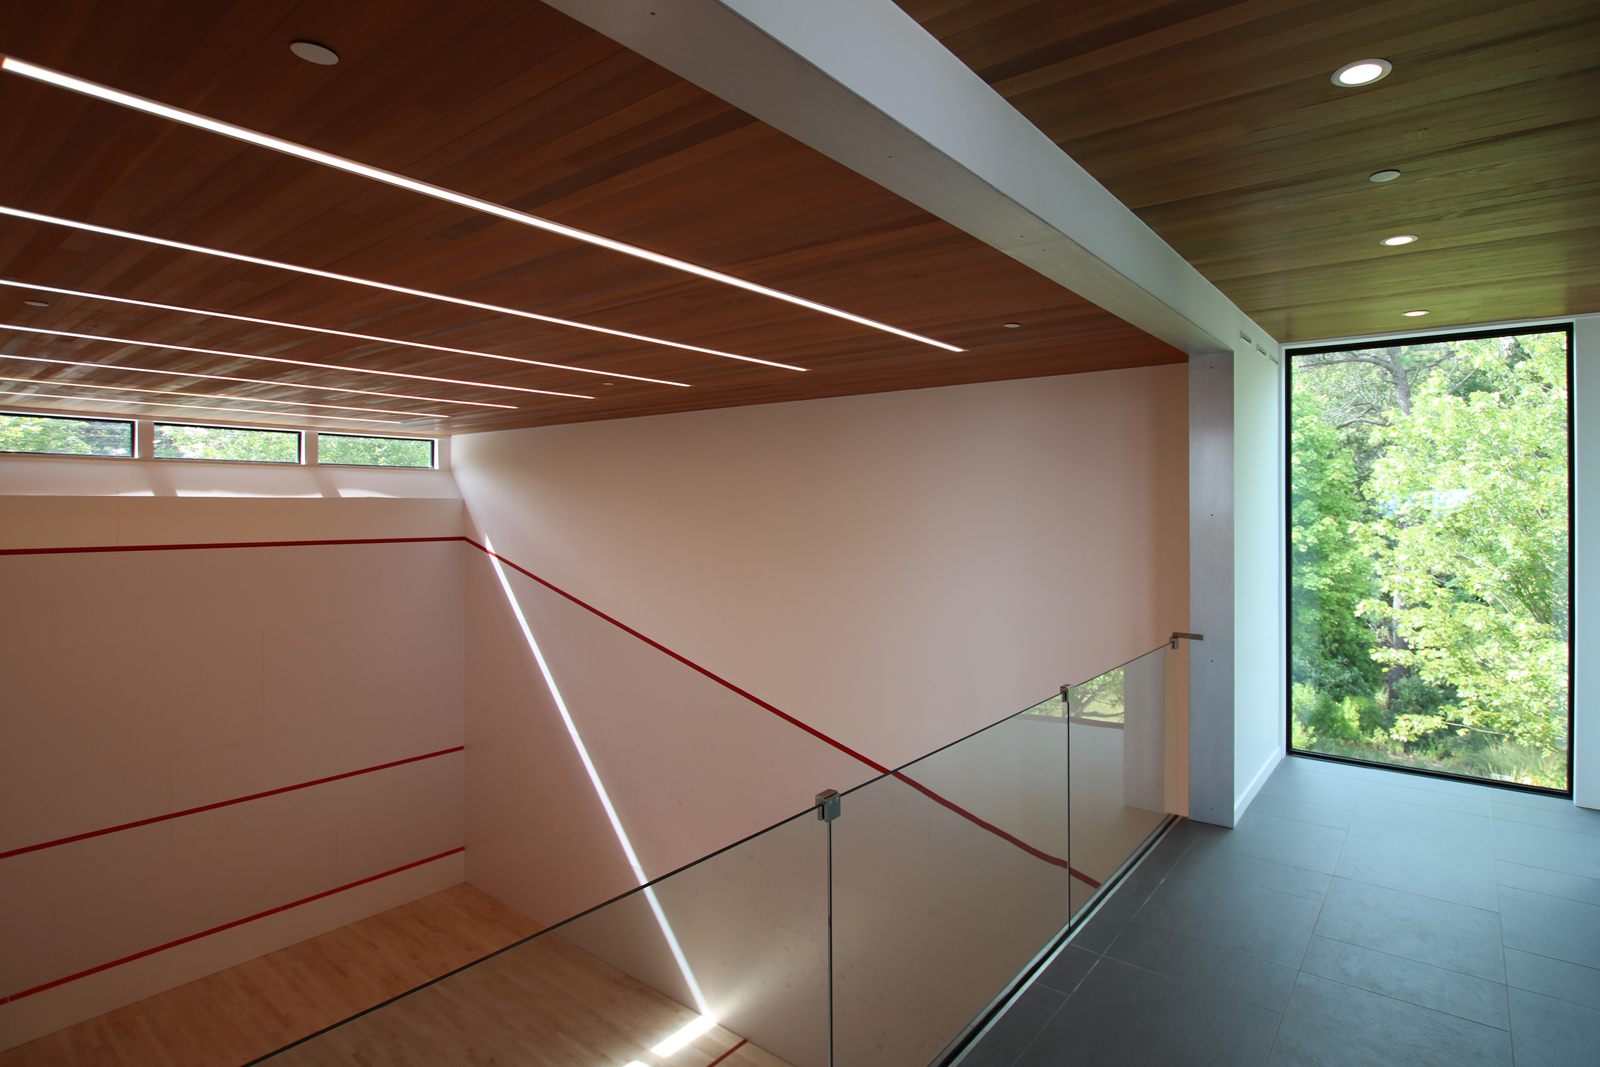 res4-resolution-4-architecture-modern-modular-house-prefab-amagansett-addition-interior-gym-lighting.jpg